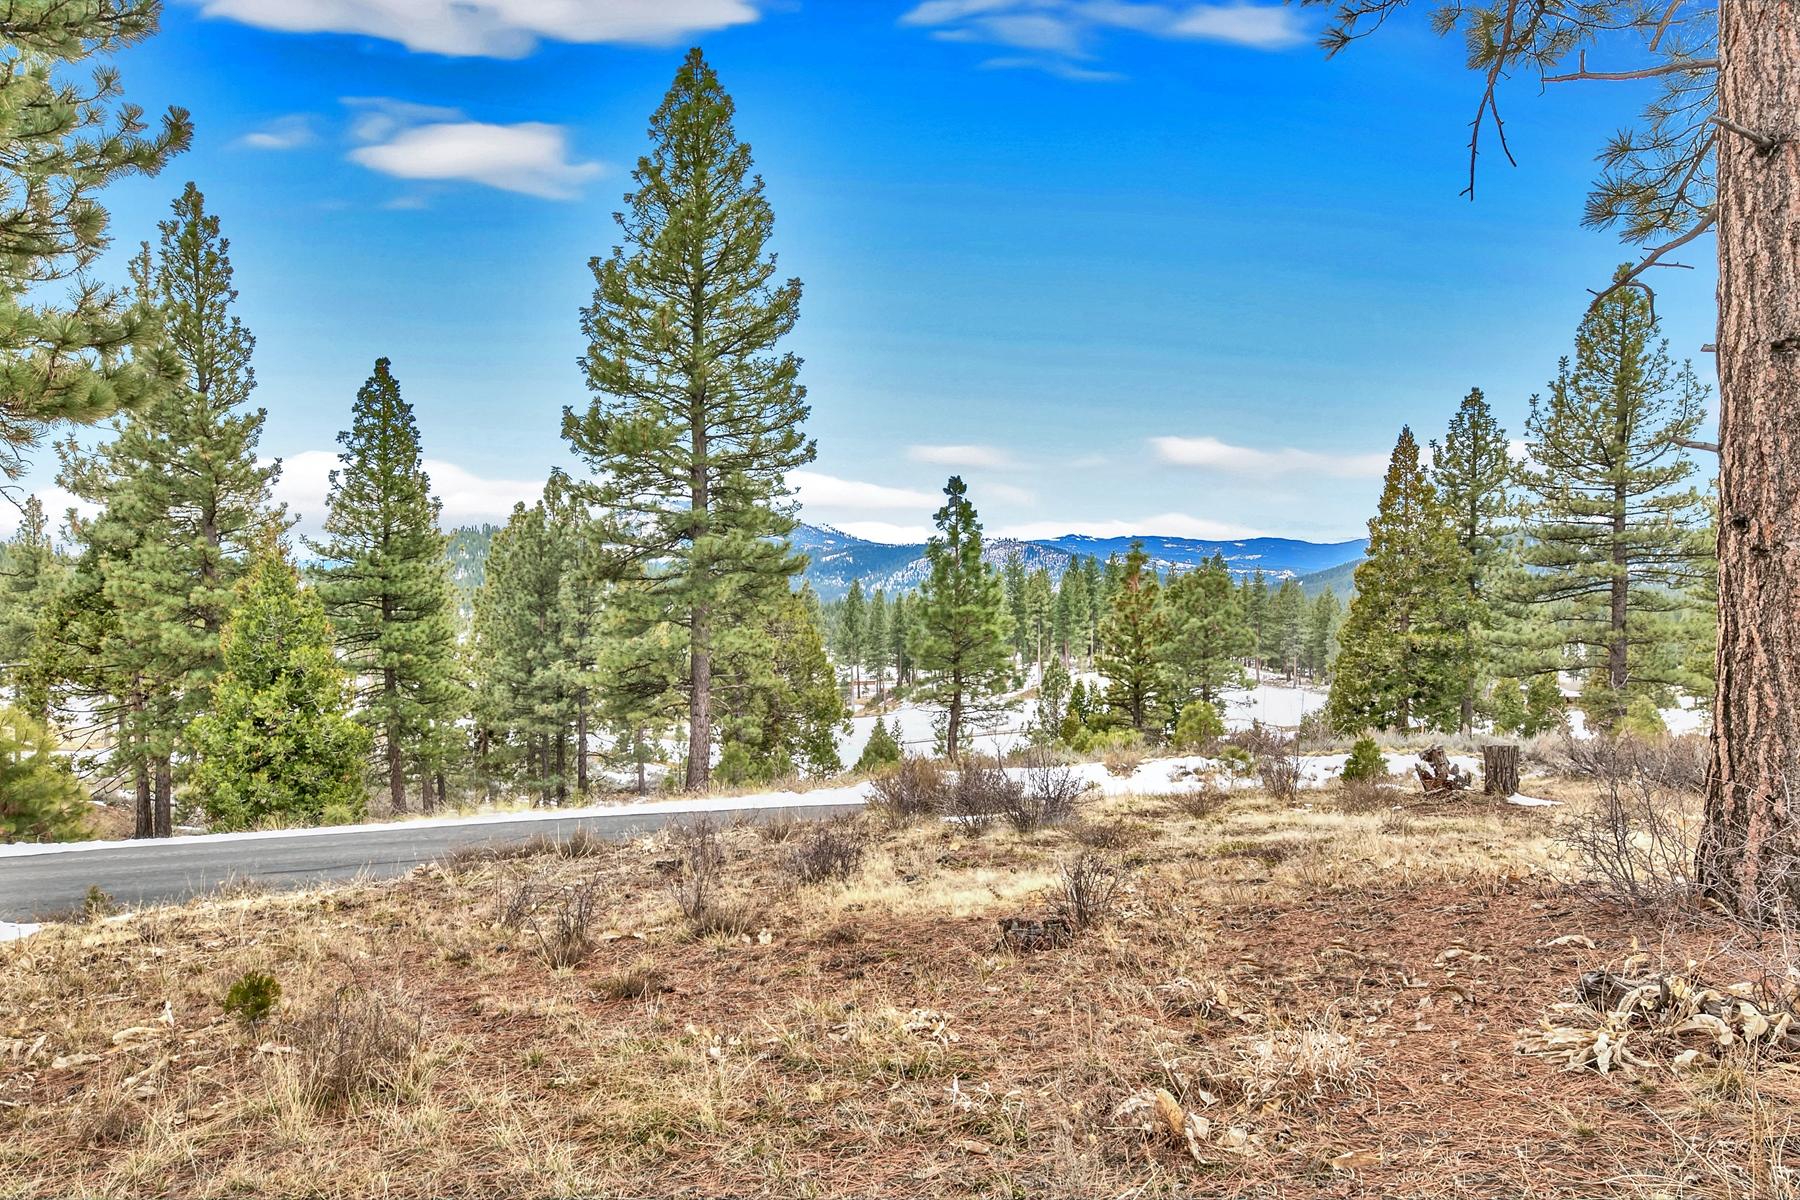 Land for Active at 27 Sorrel Lane, Portola CA 96122 27 Sorrel Lane Portola, California 96122 United States